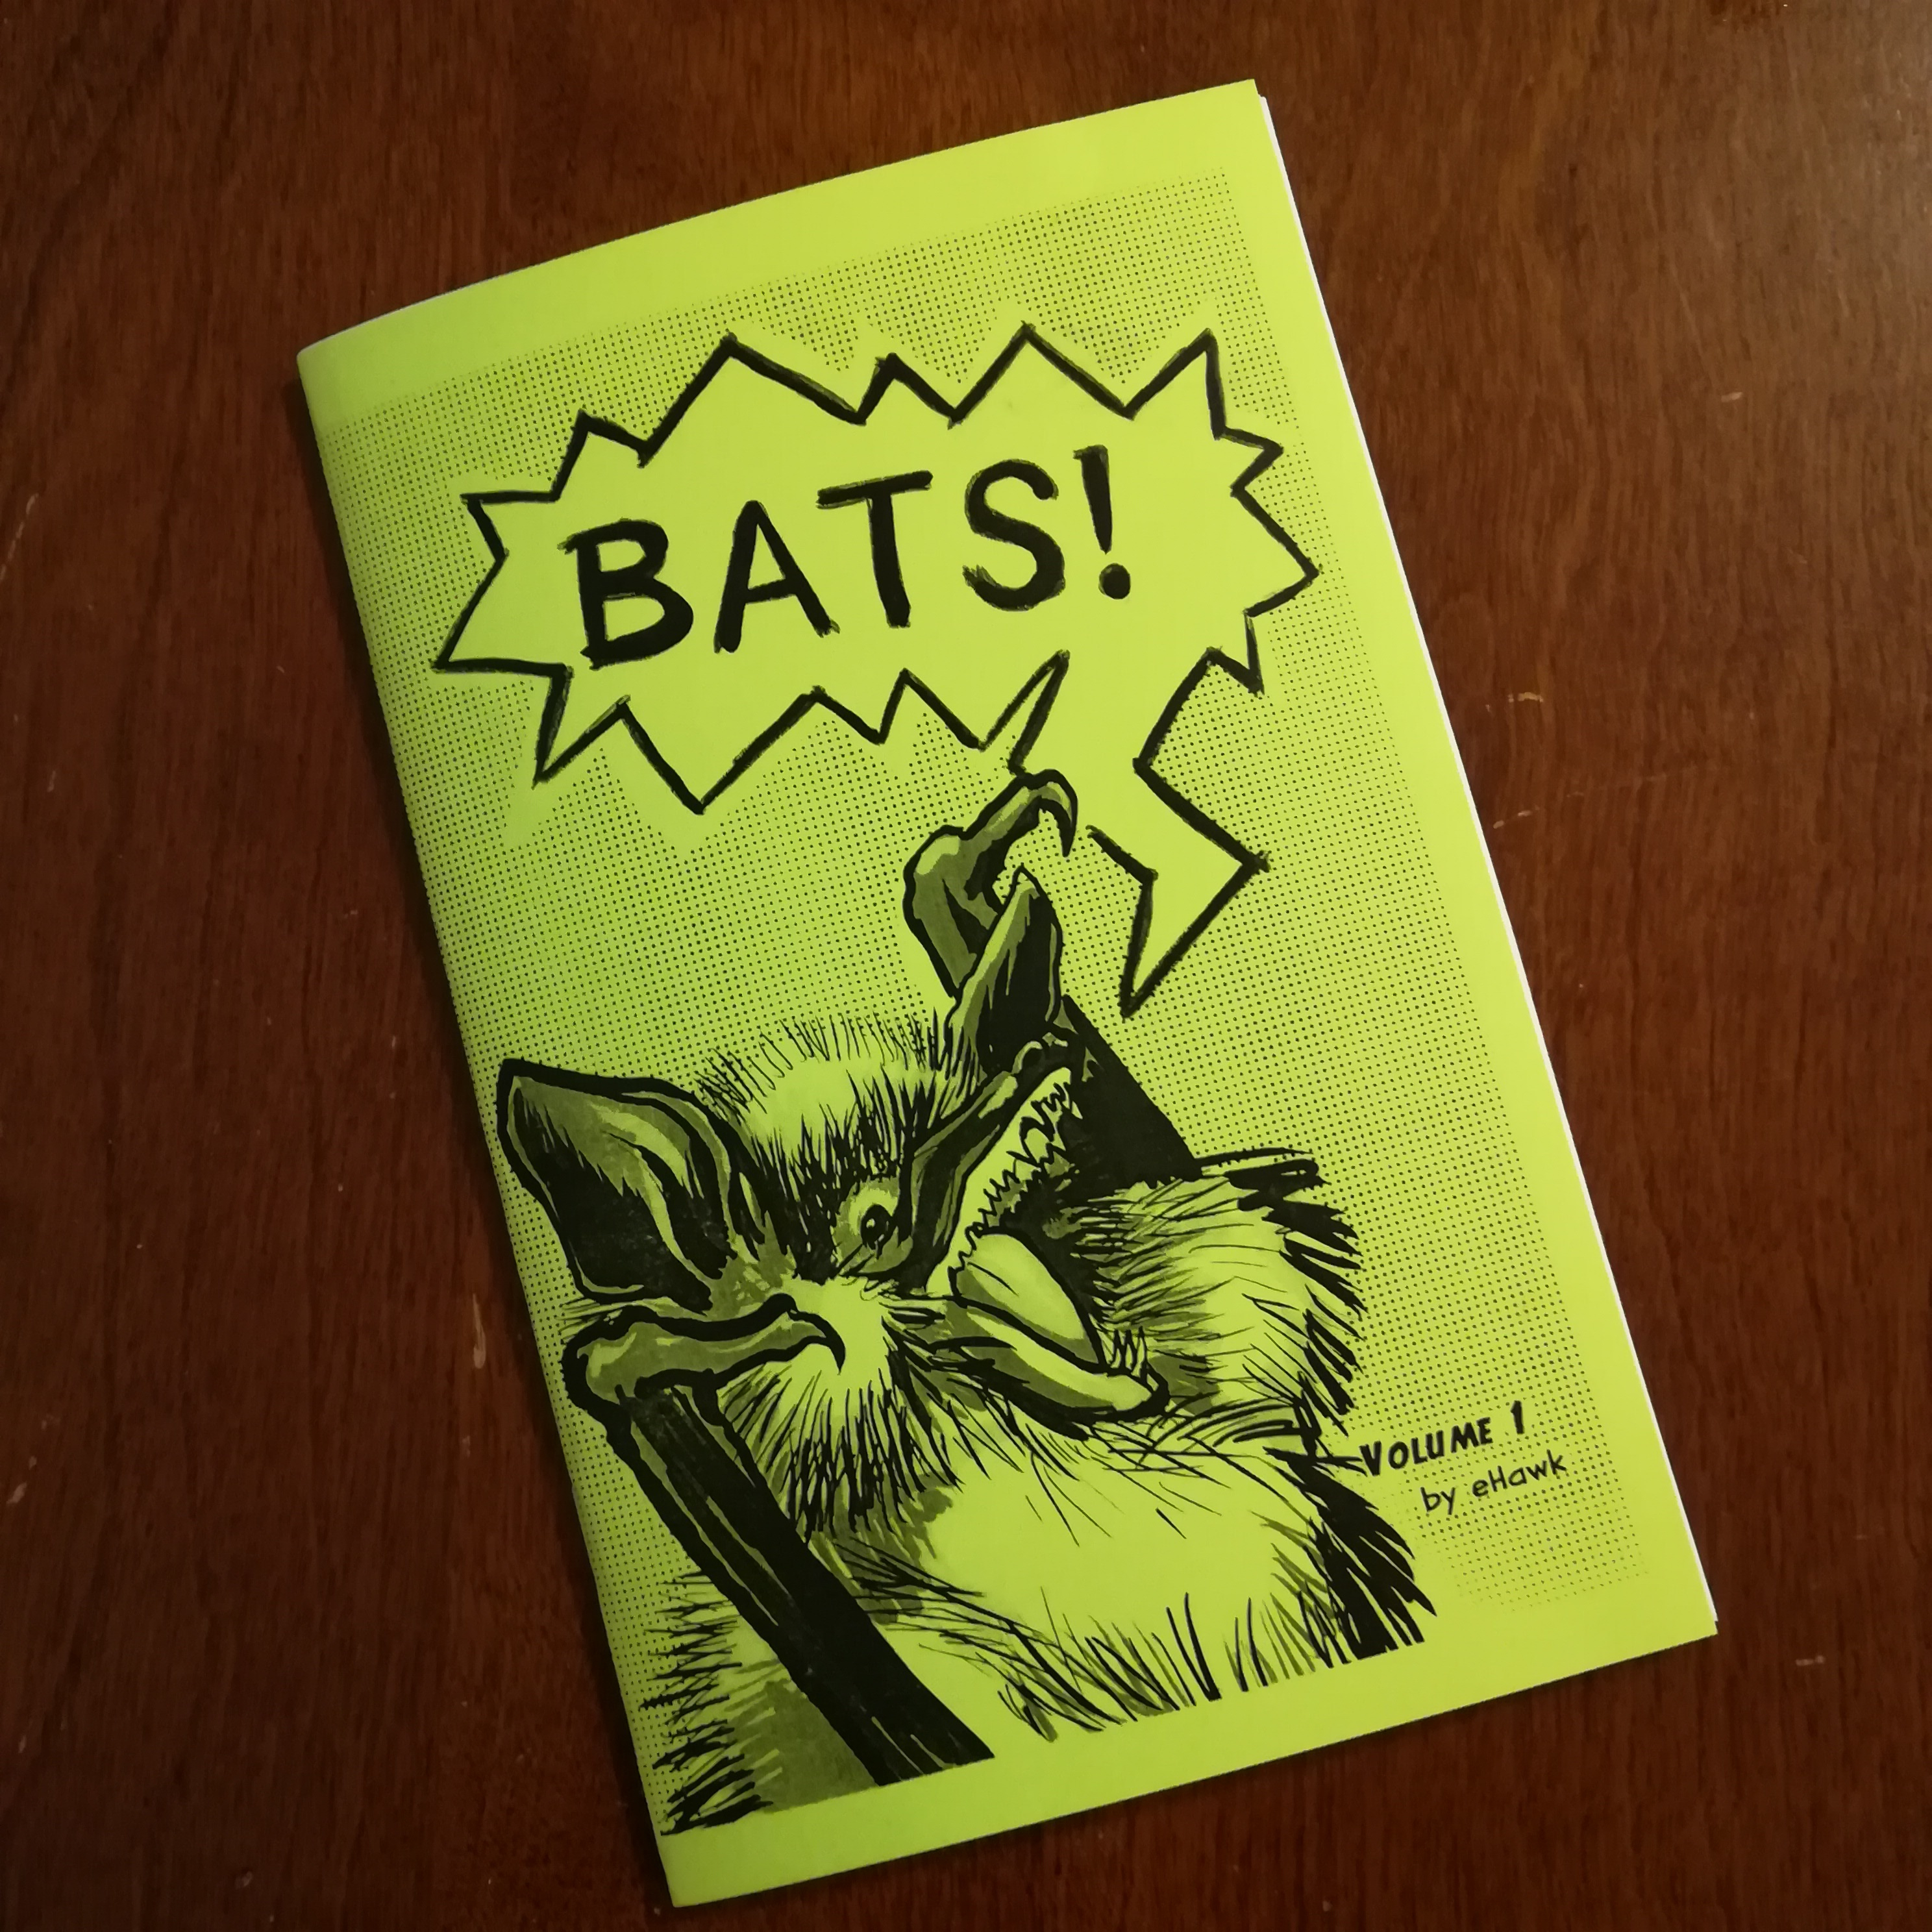 Bats! Volume 1 00000